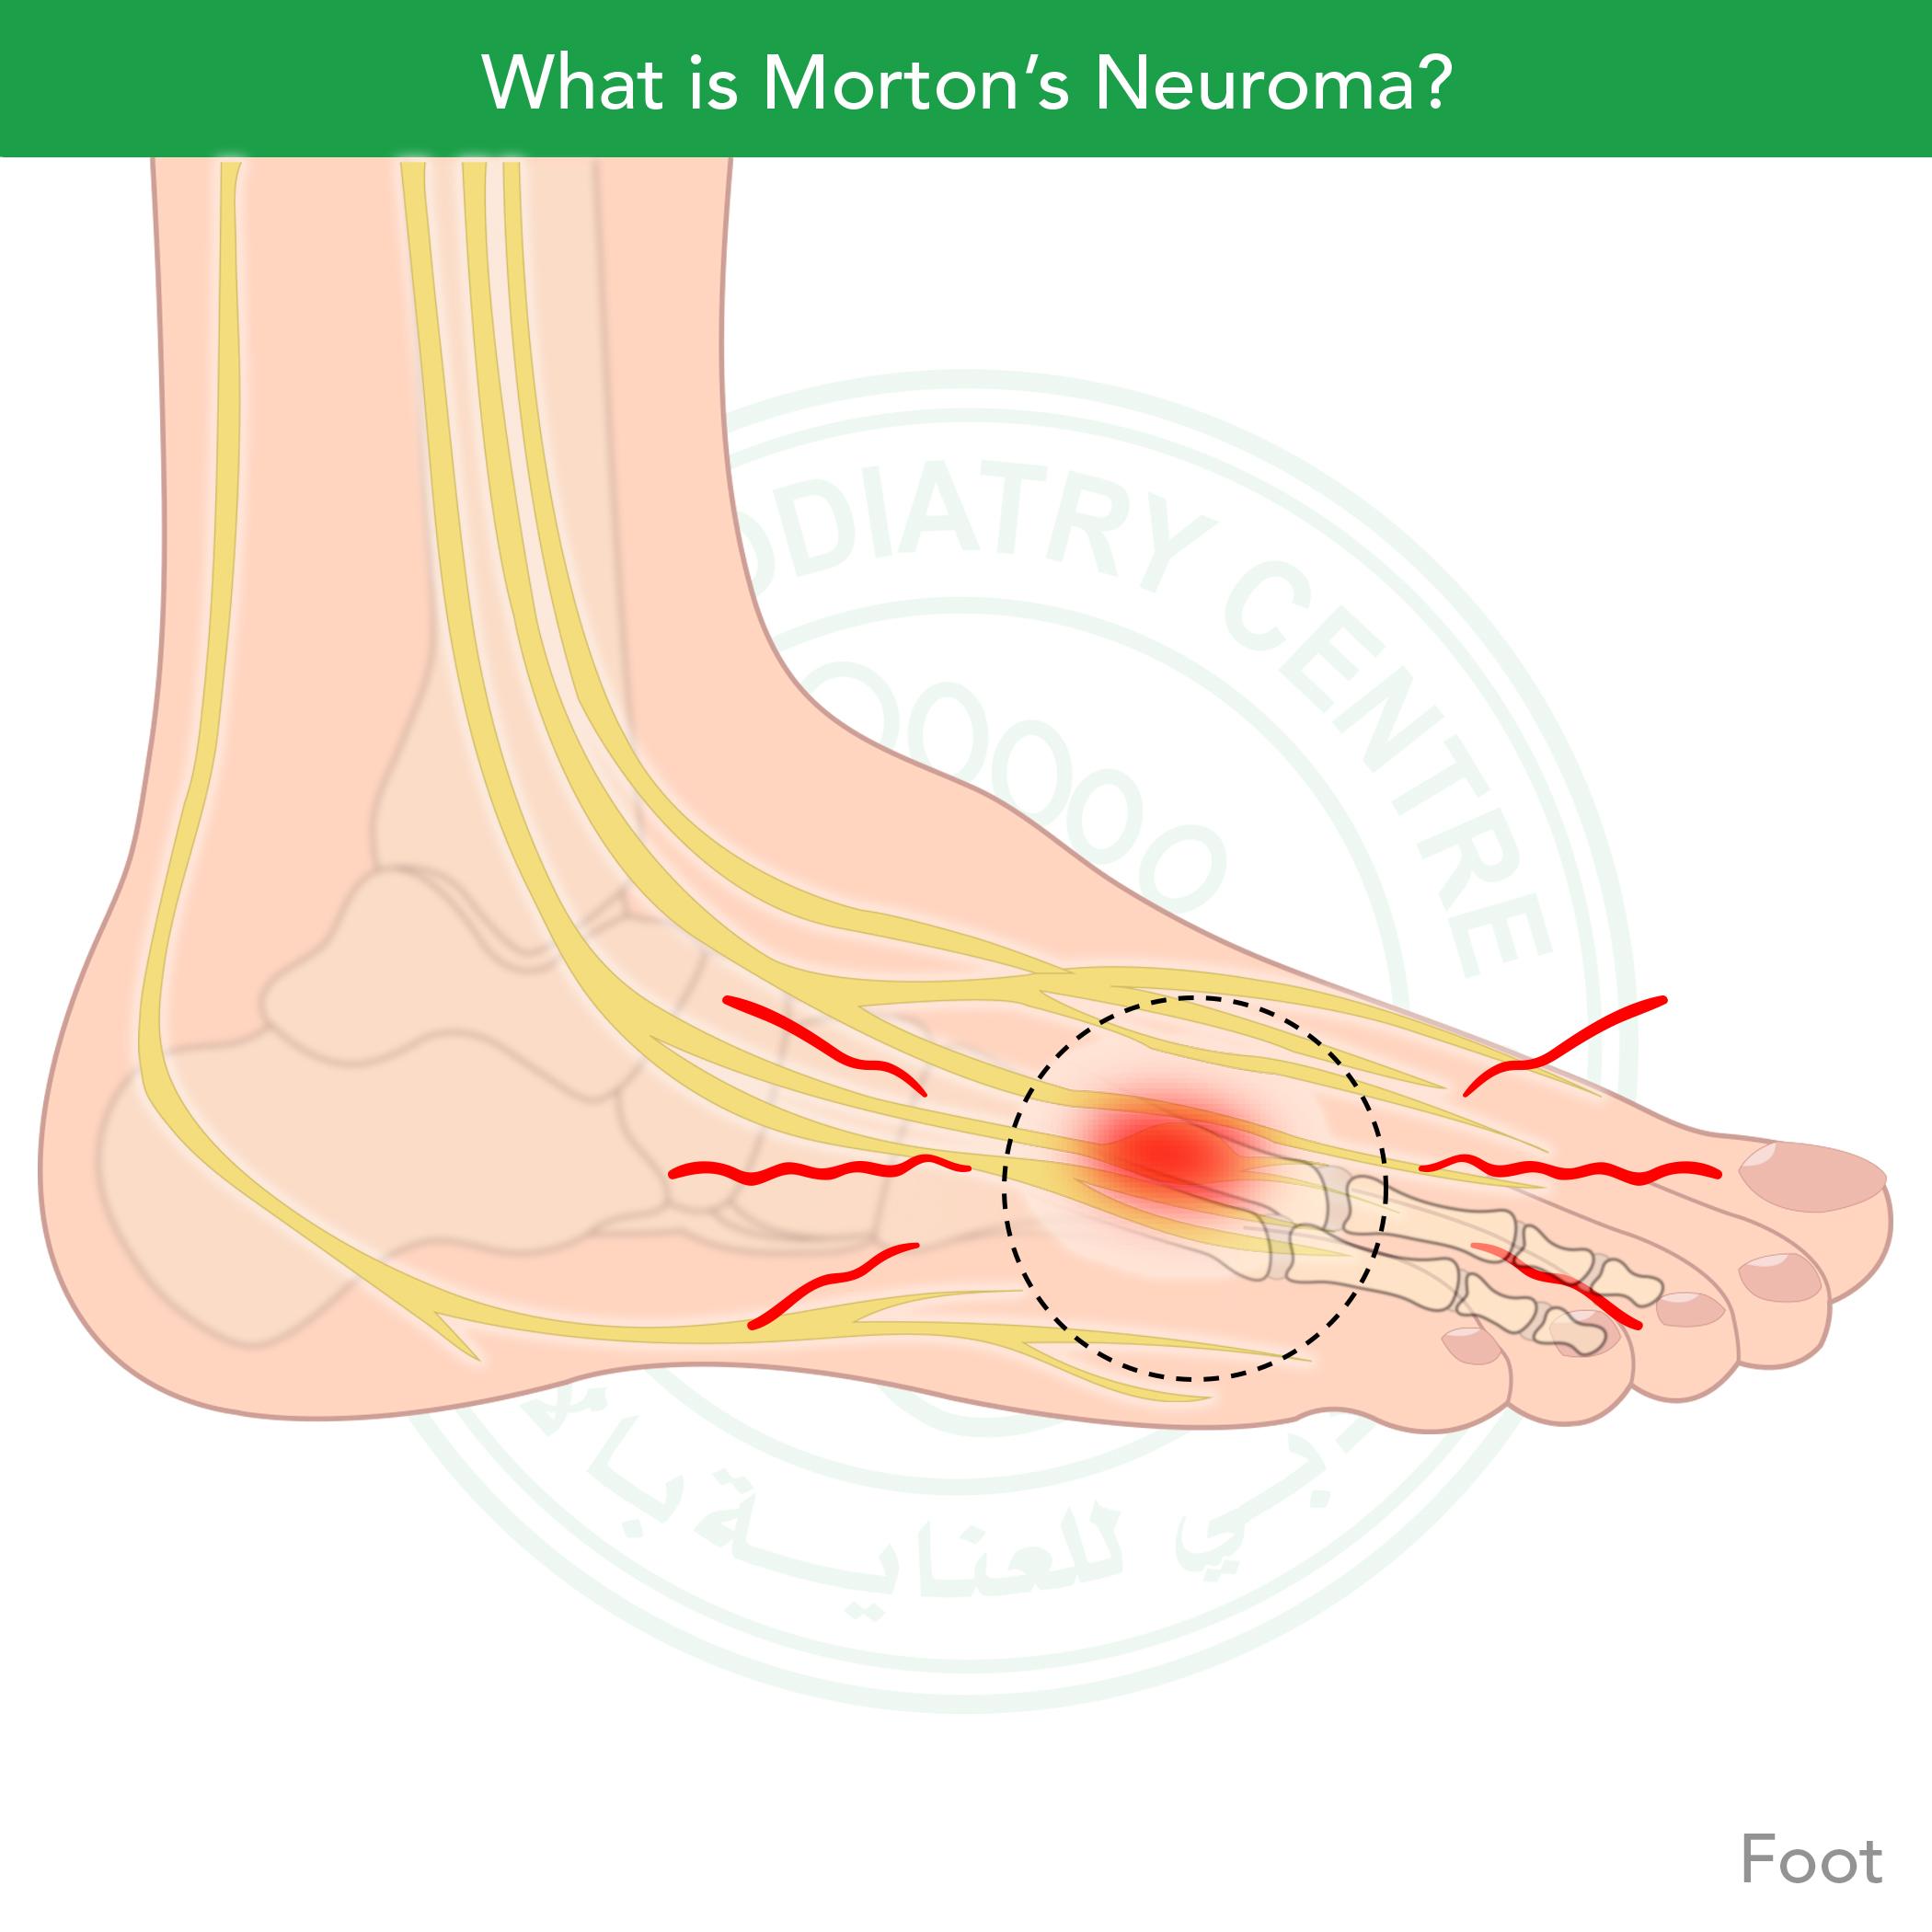 https://dubaipodiatry.com/wp-content/uploads/2019/03/DPC-voice-record_Mortons-Neuroma-21.jpg